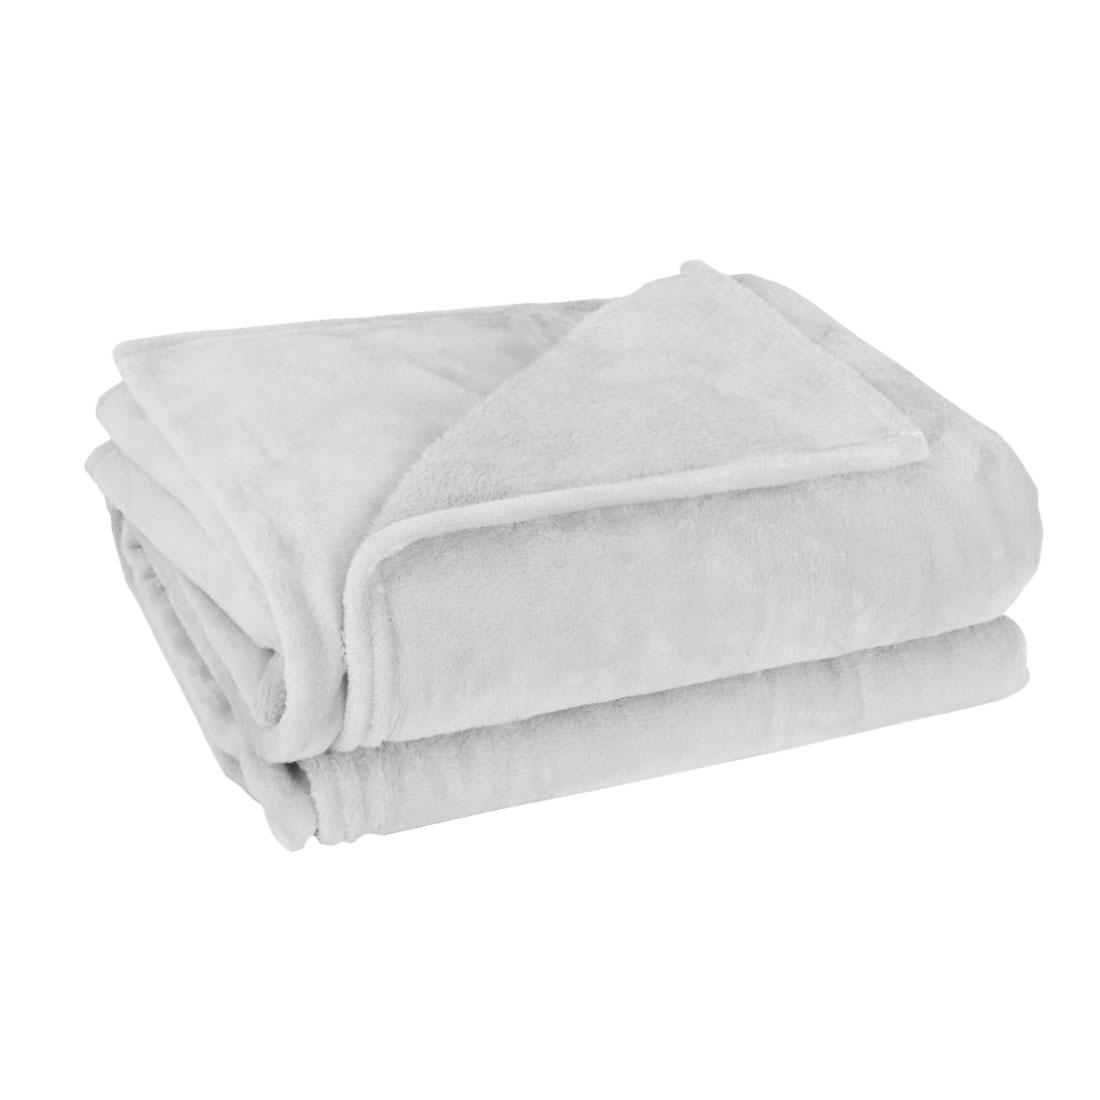 230 x 250cm Home Bedroom Warm Throw Blanket Rug Plush Fleece Bed Quilt Sofa Soft Pure Light Gray